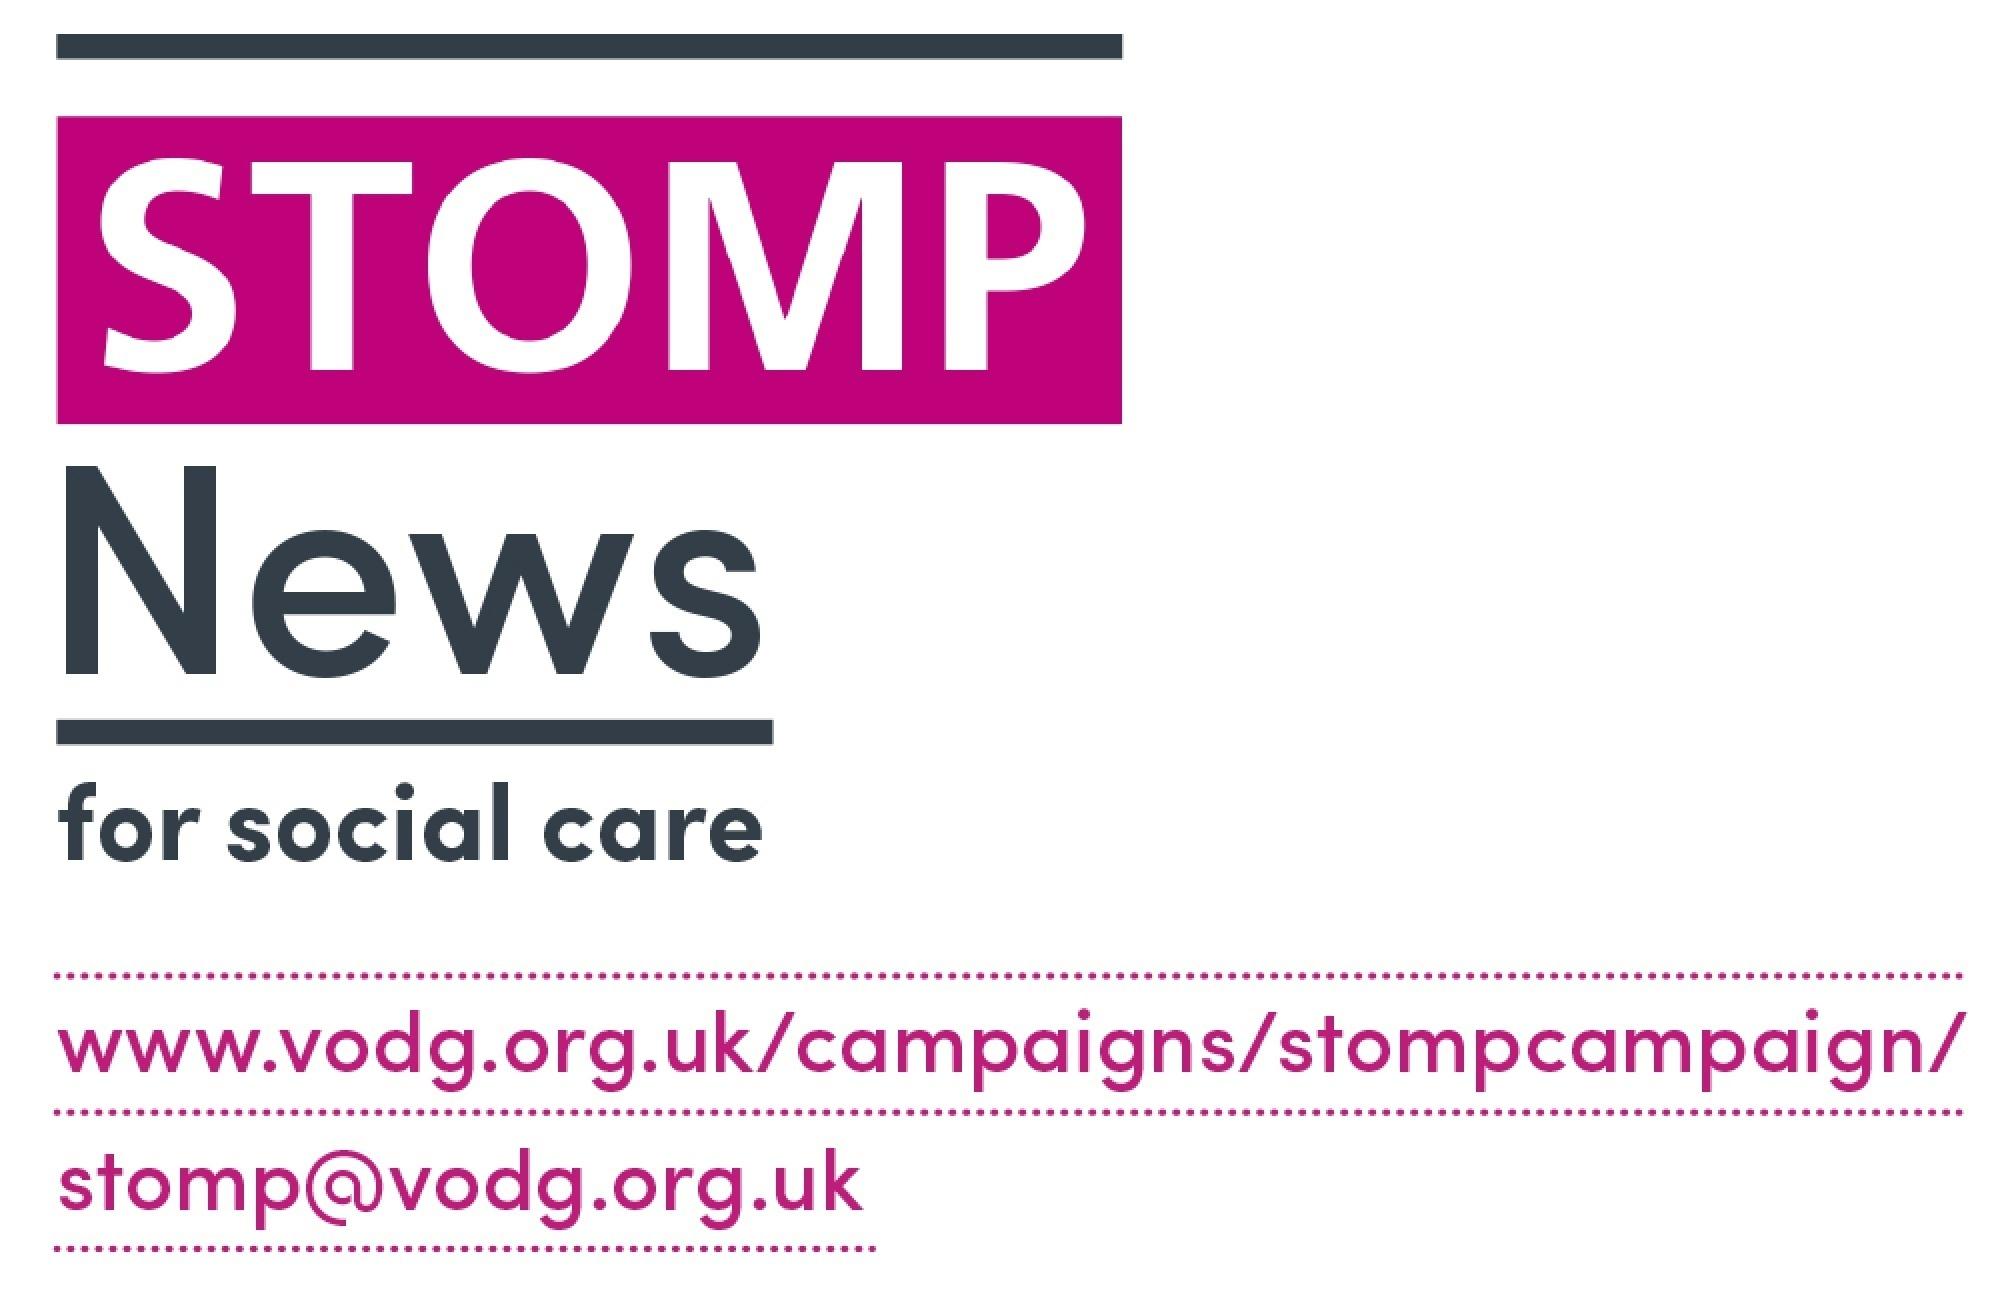 2017 STOMP NEWS (1st Ed)